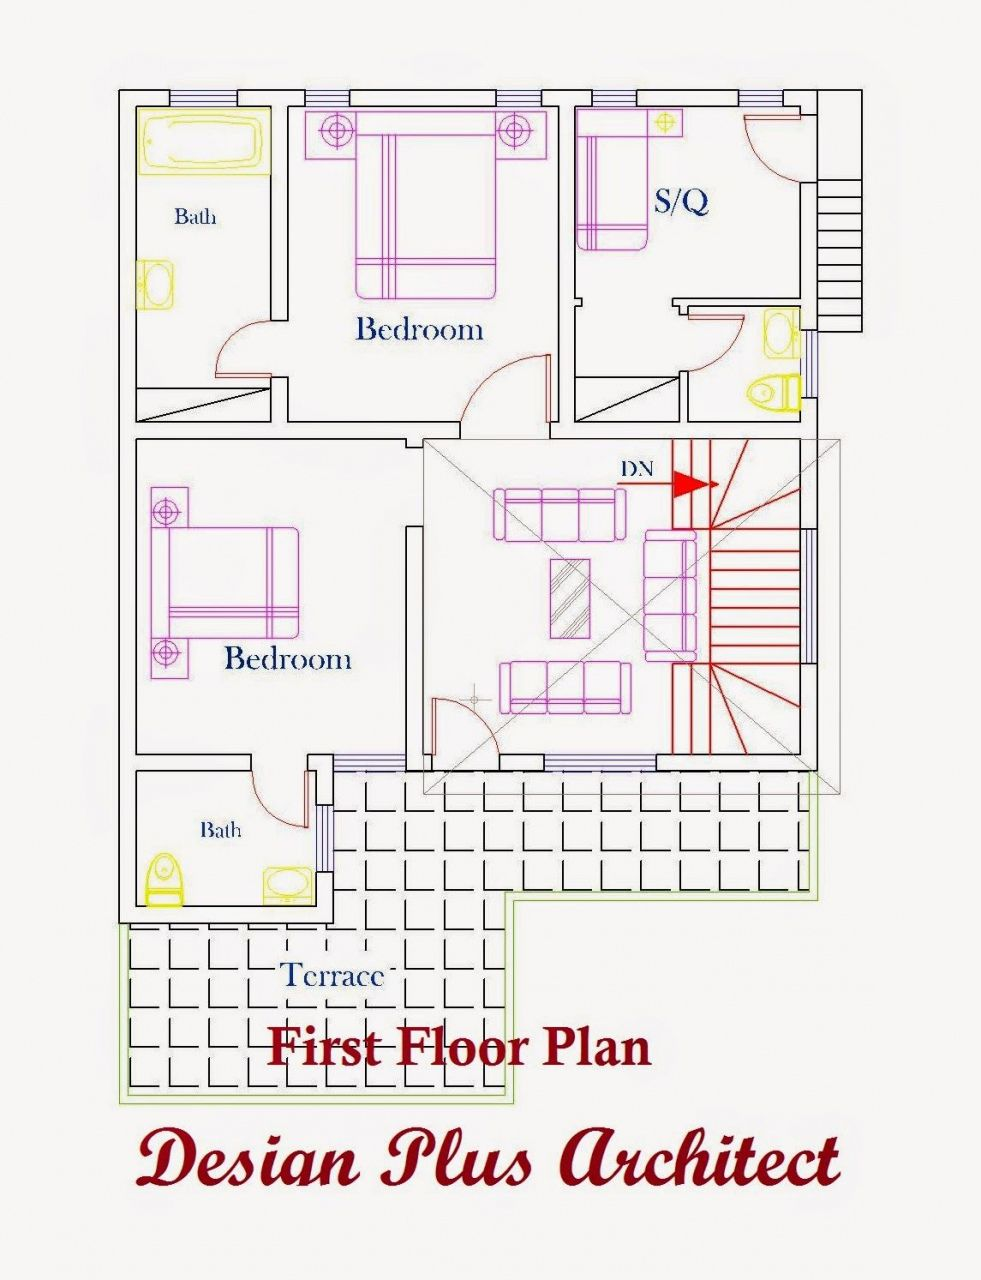 55 2d Design House 2019 House Plans Floor Plan Design House Floor Plans